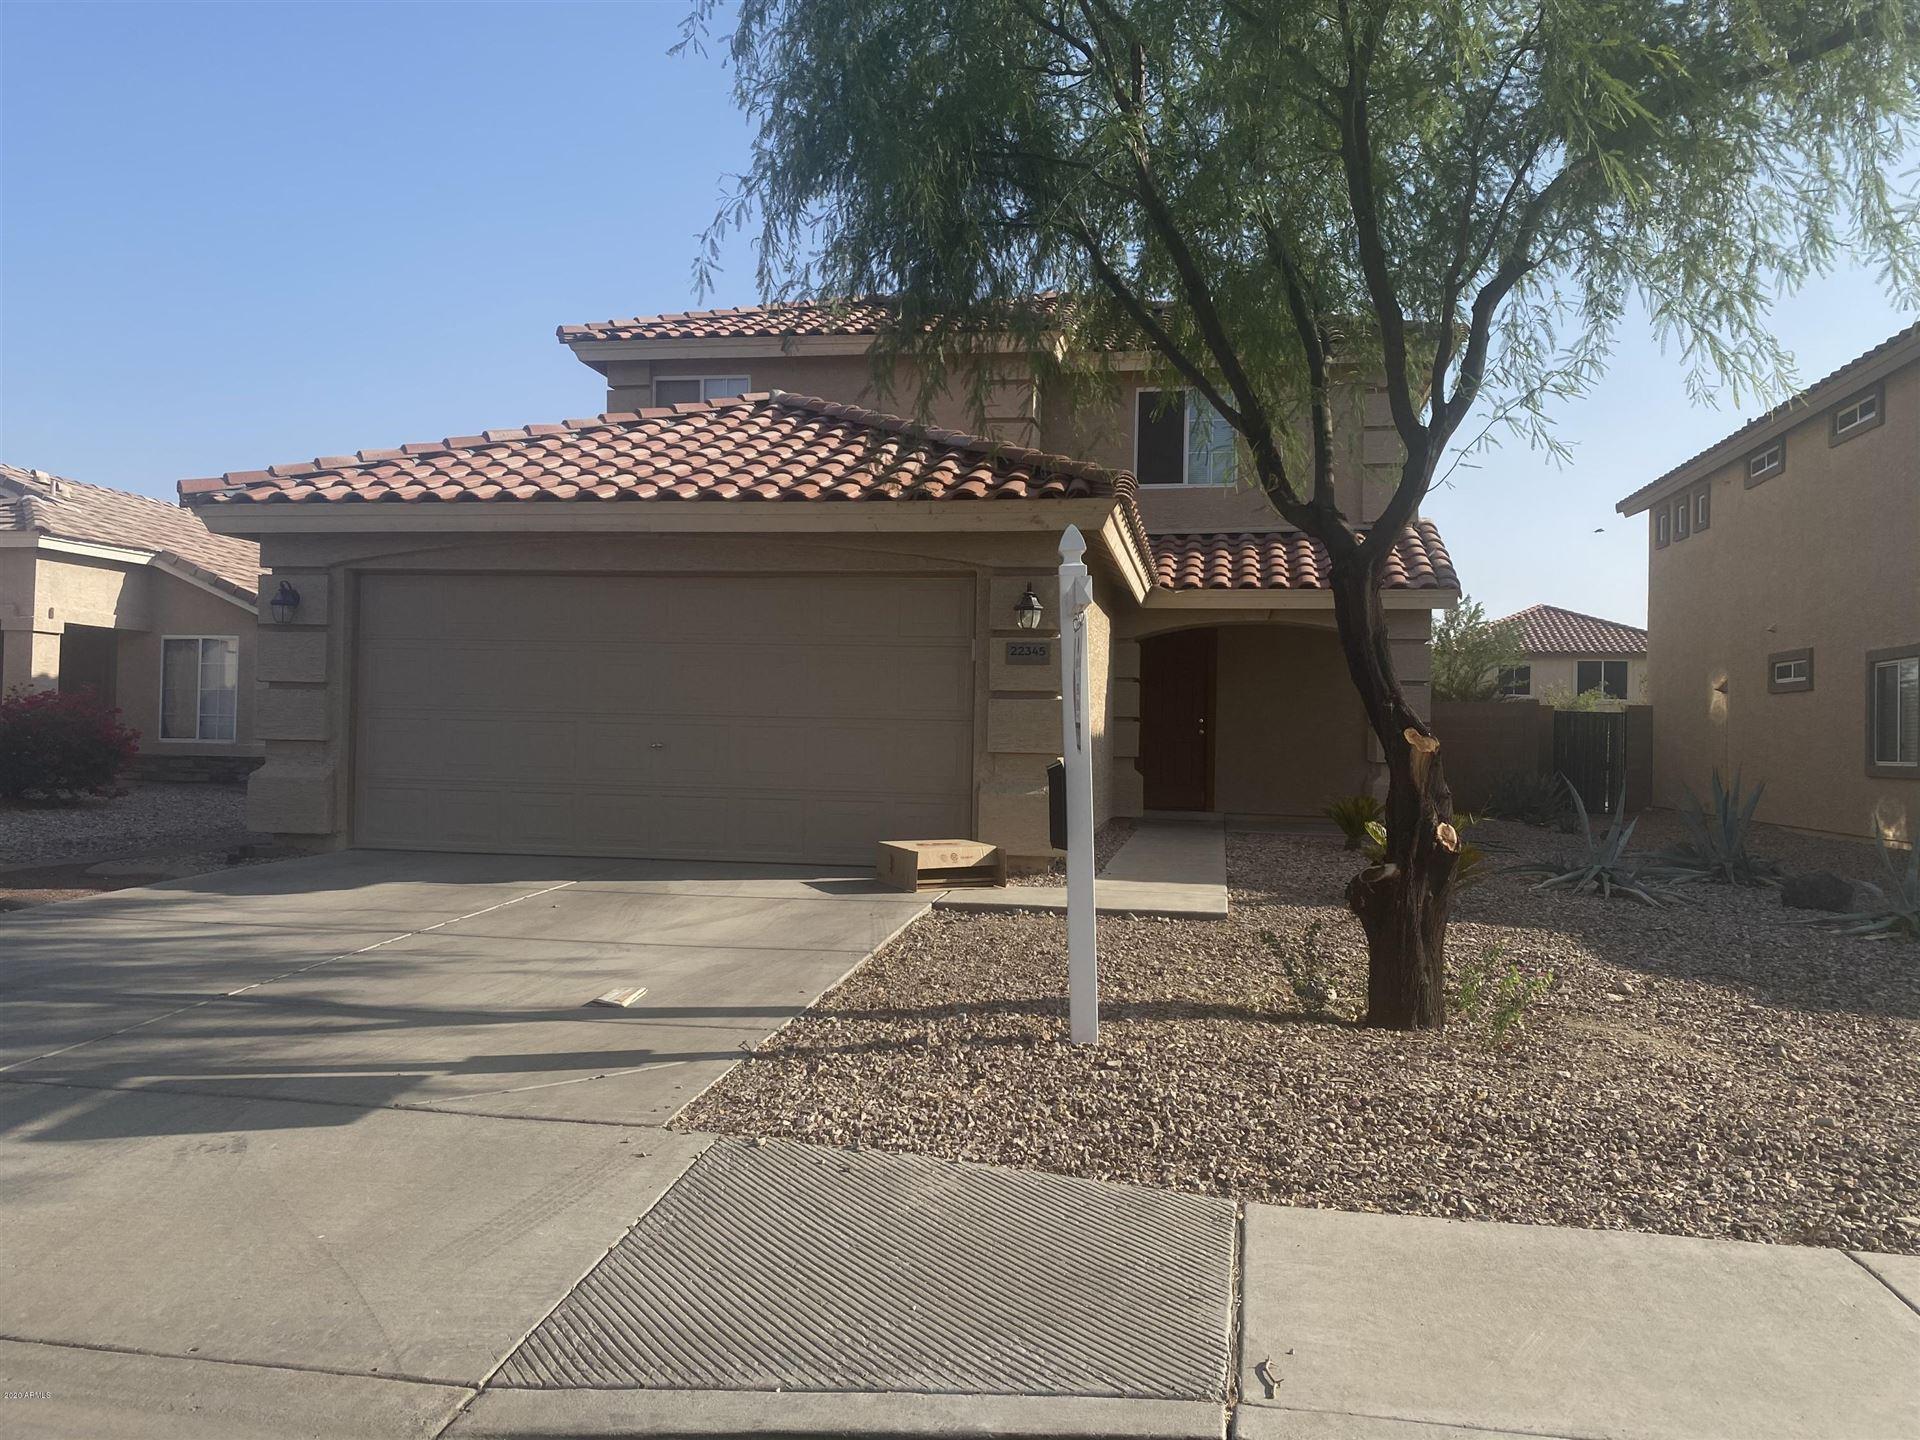 22345 W DEVIN Drive, Buckeye, AZ 85326 - MLS#: 6136477